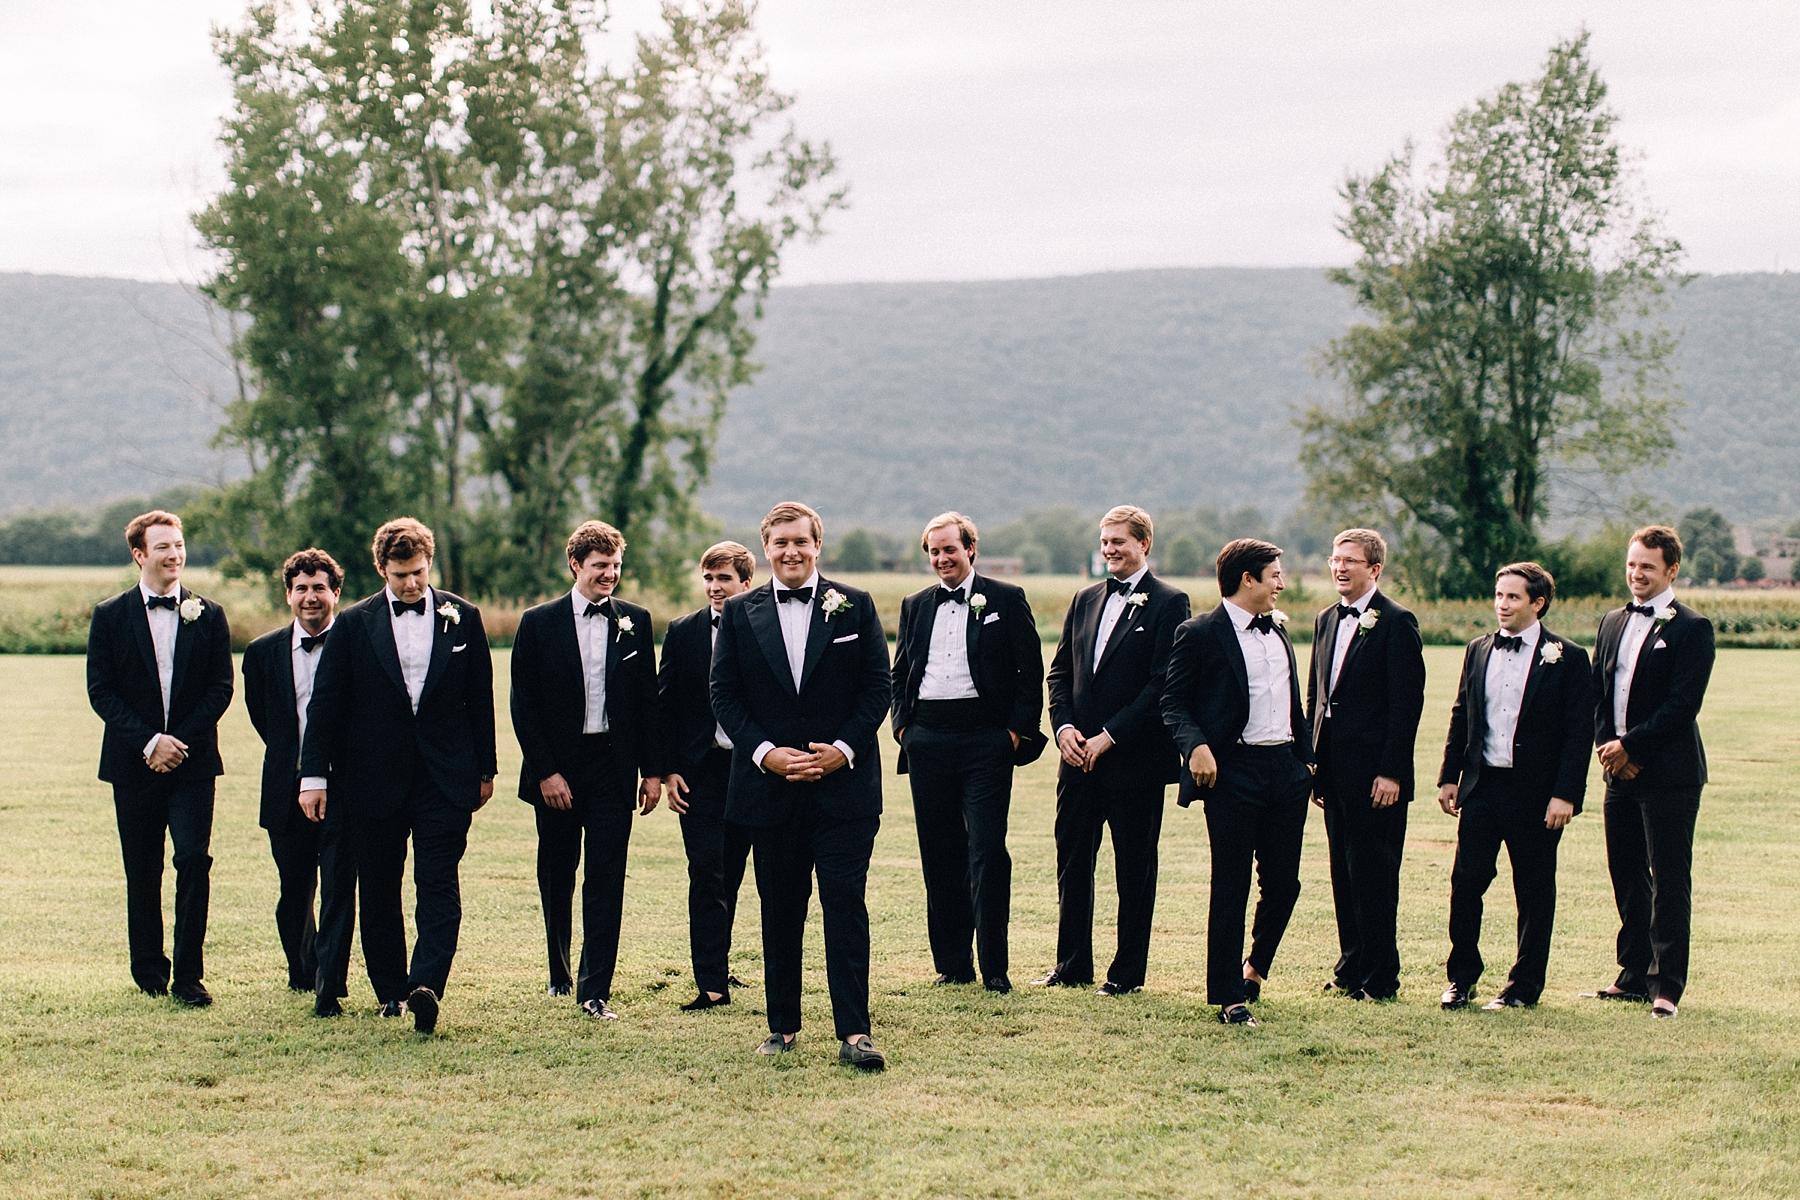 mashomack-preserve-polo-club-wedding-ny-photographer_0061.jpg